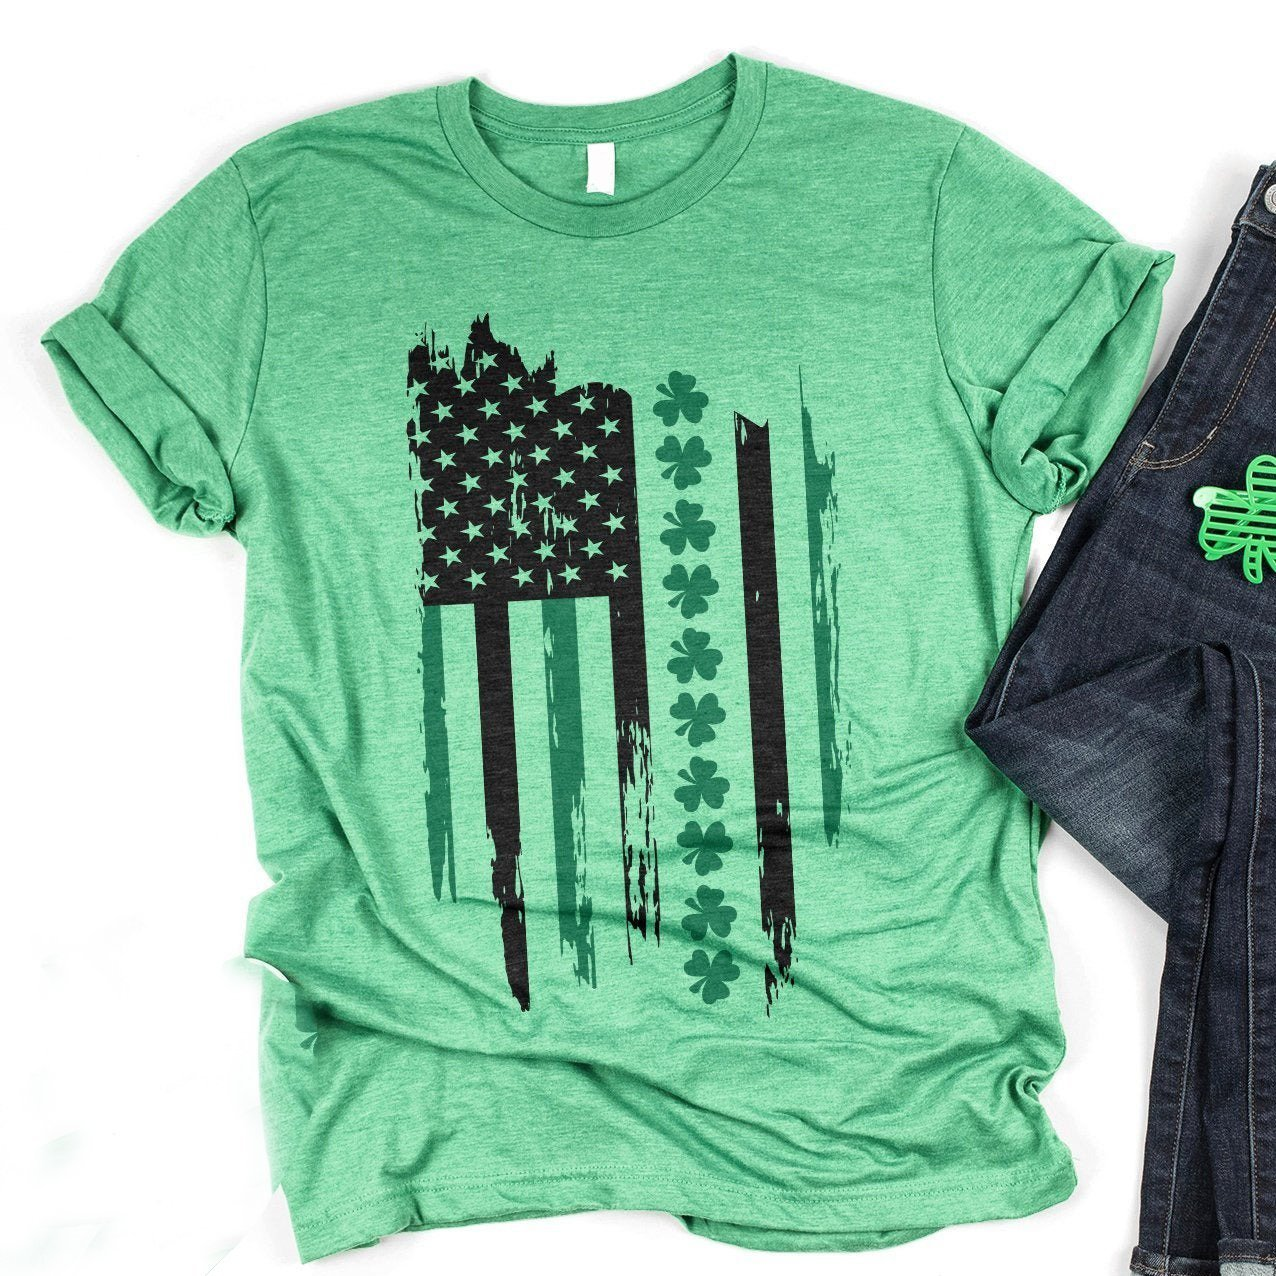 G2 St. patrick's day irish american flag vintage shamrock t-shirt GST